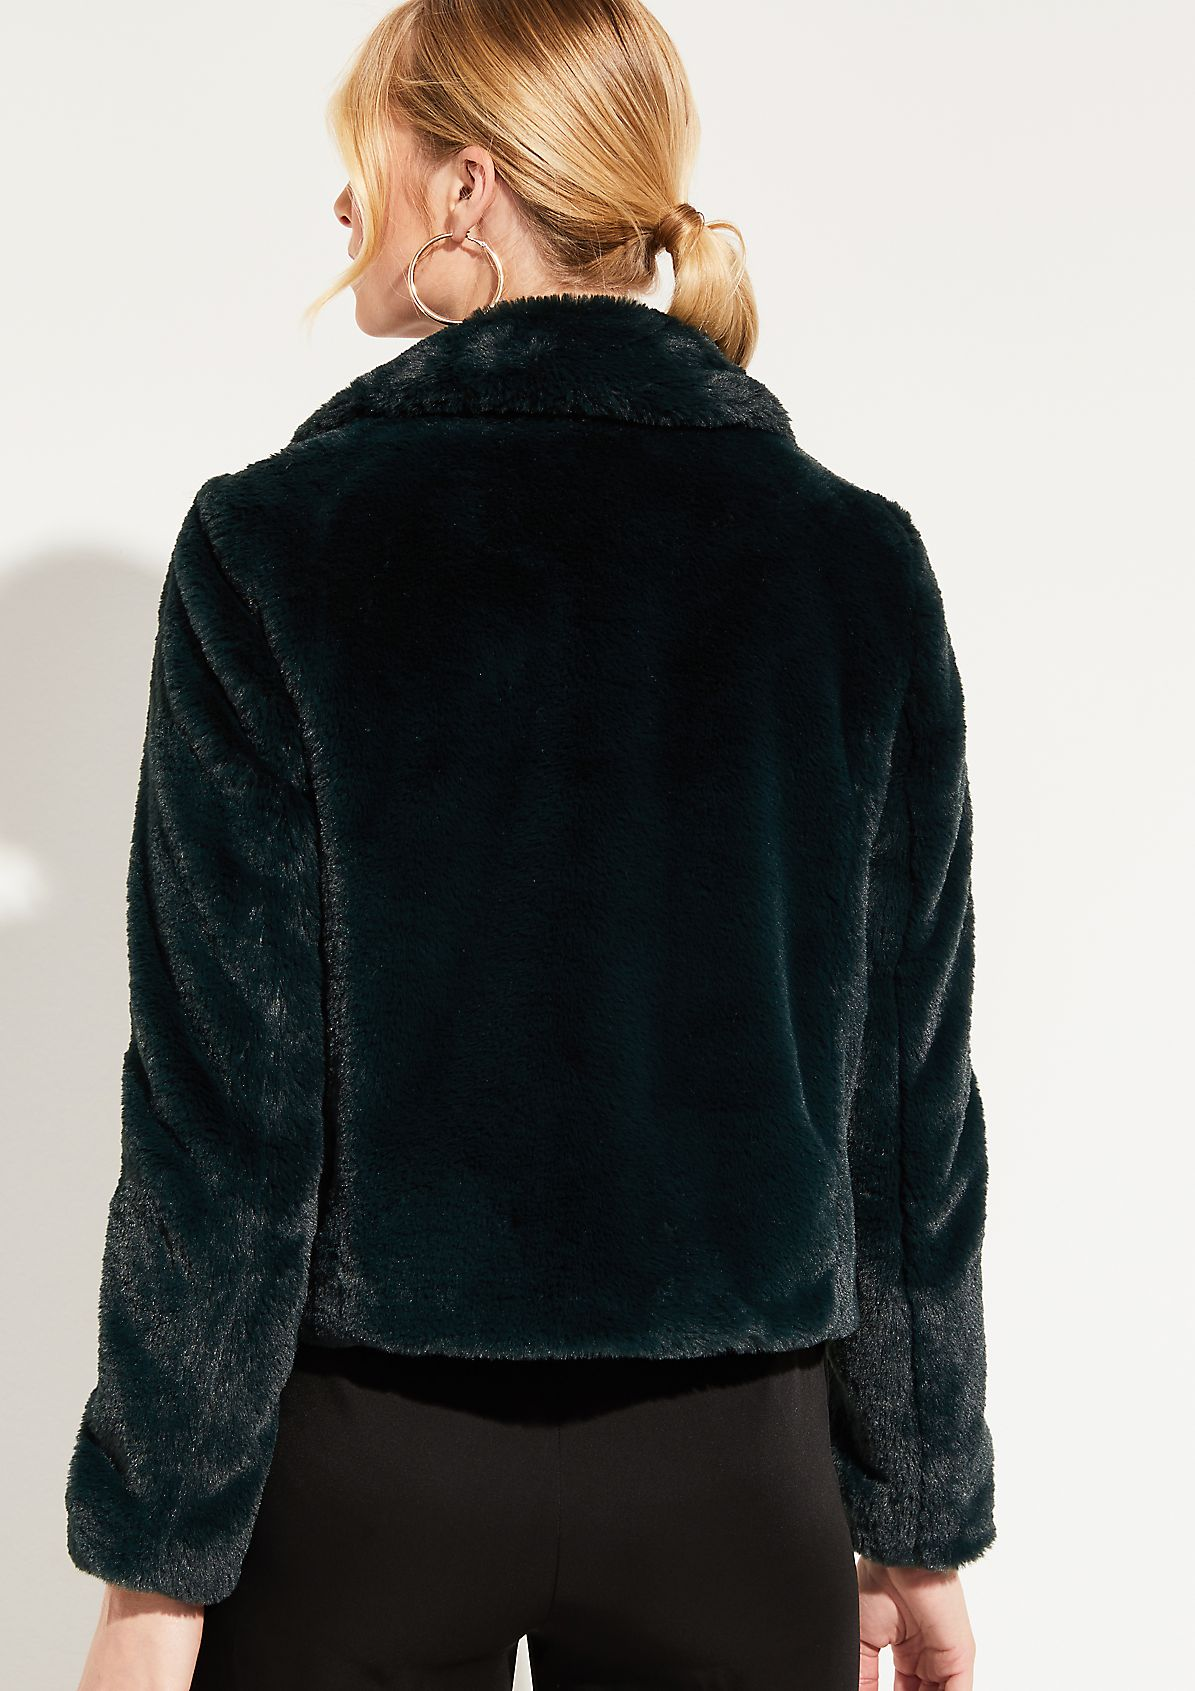 Jacke aus kuscheligem Fellimitat